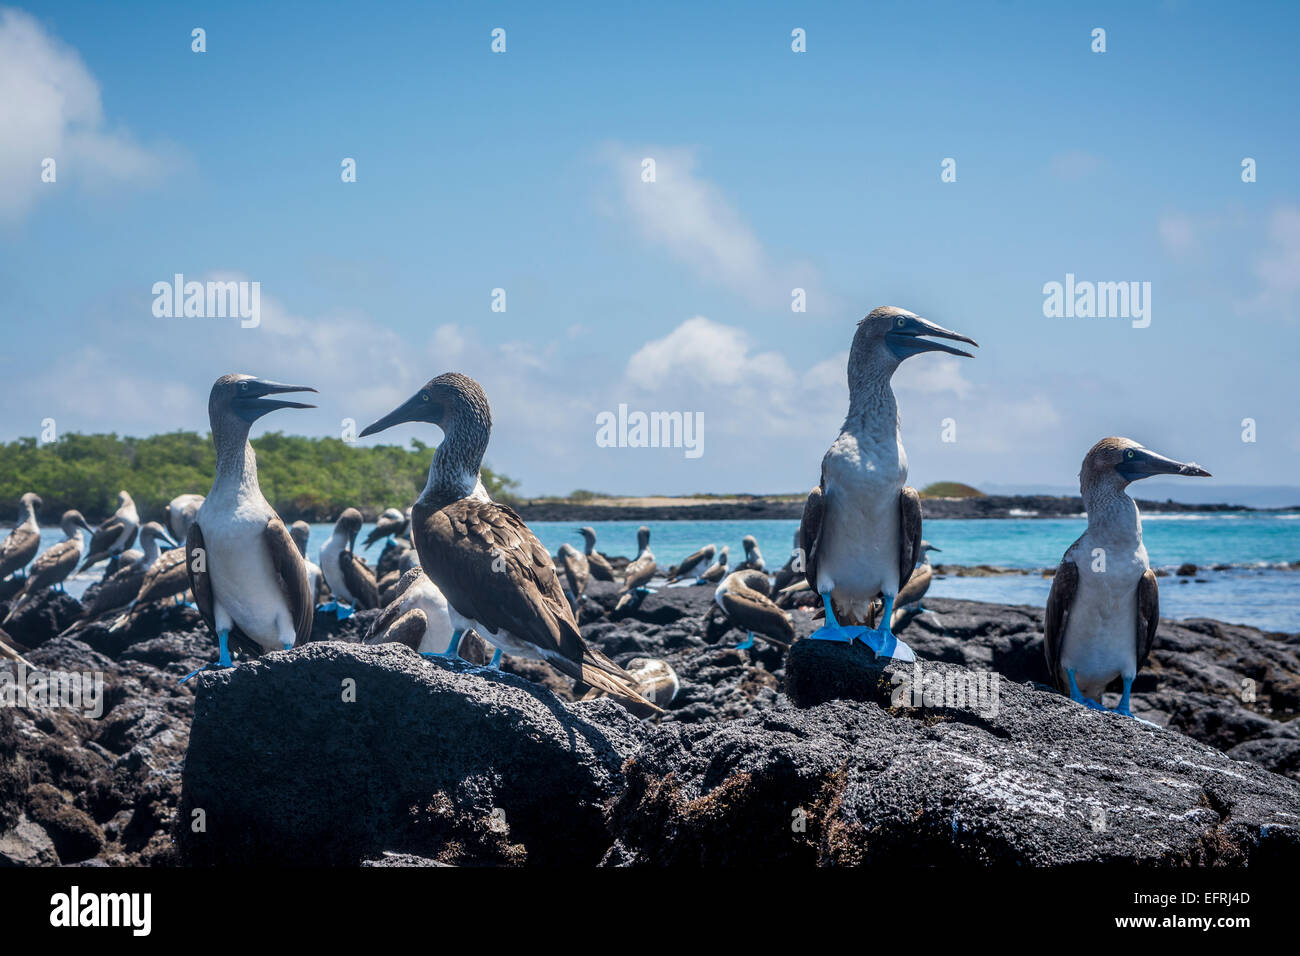 Blue-footed Booby, Galapagos Islands, Ecuador - Stock Image